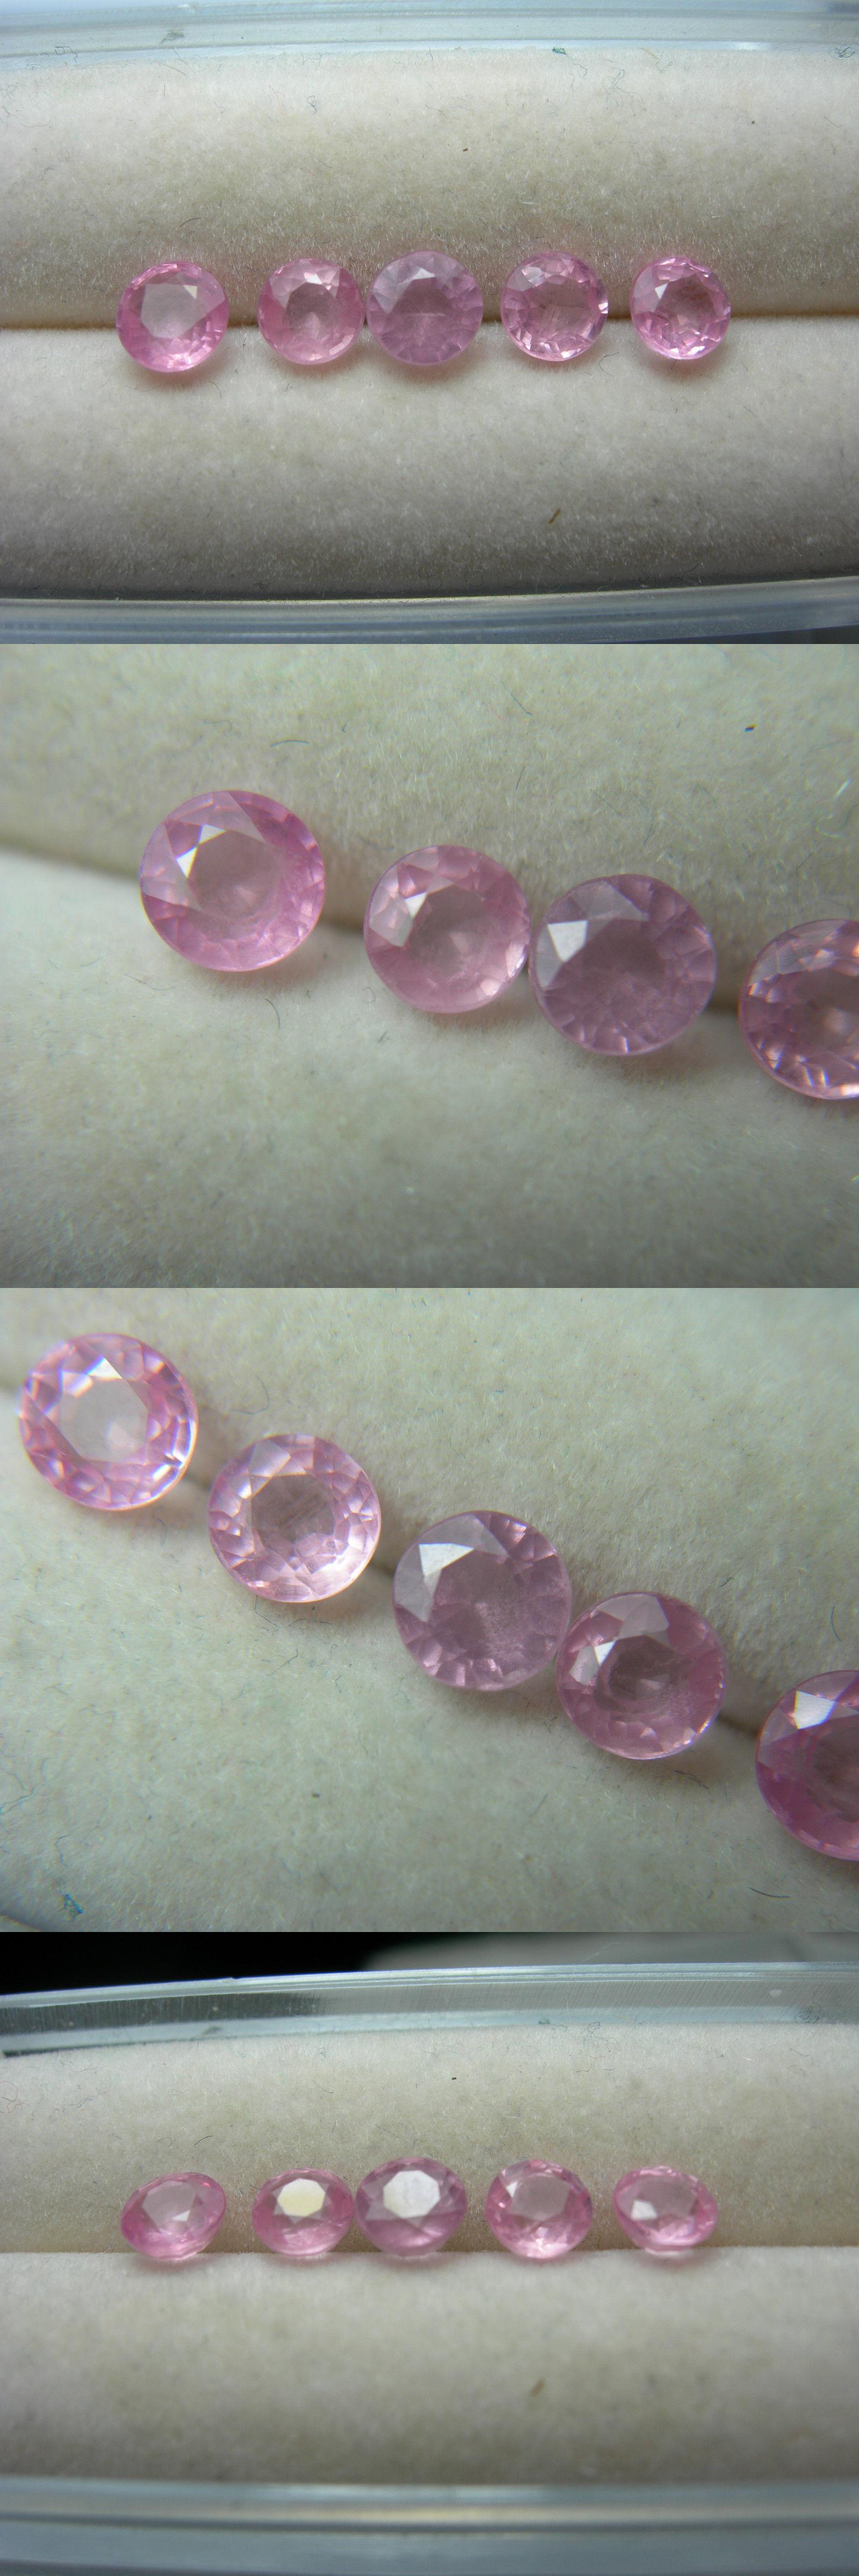 Spinel 110873: 5 Rare Fancy Pink Spinel Gems Tanzania Round ...